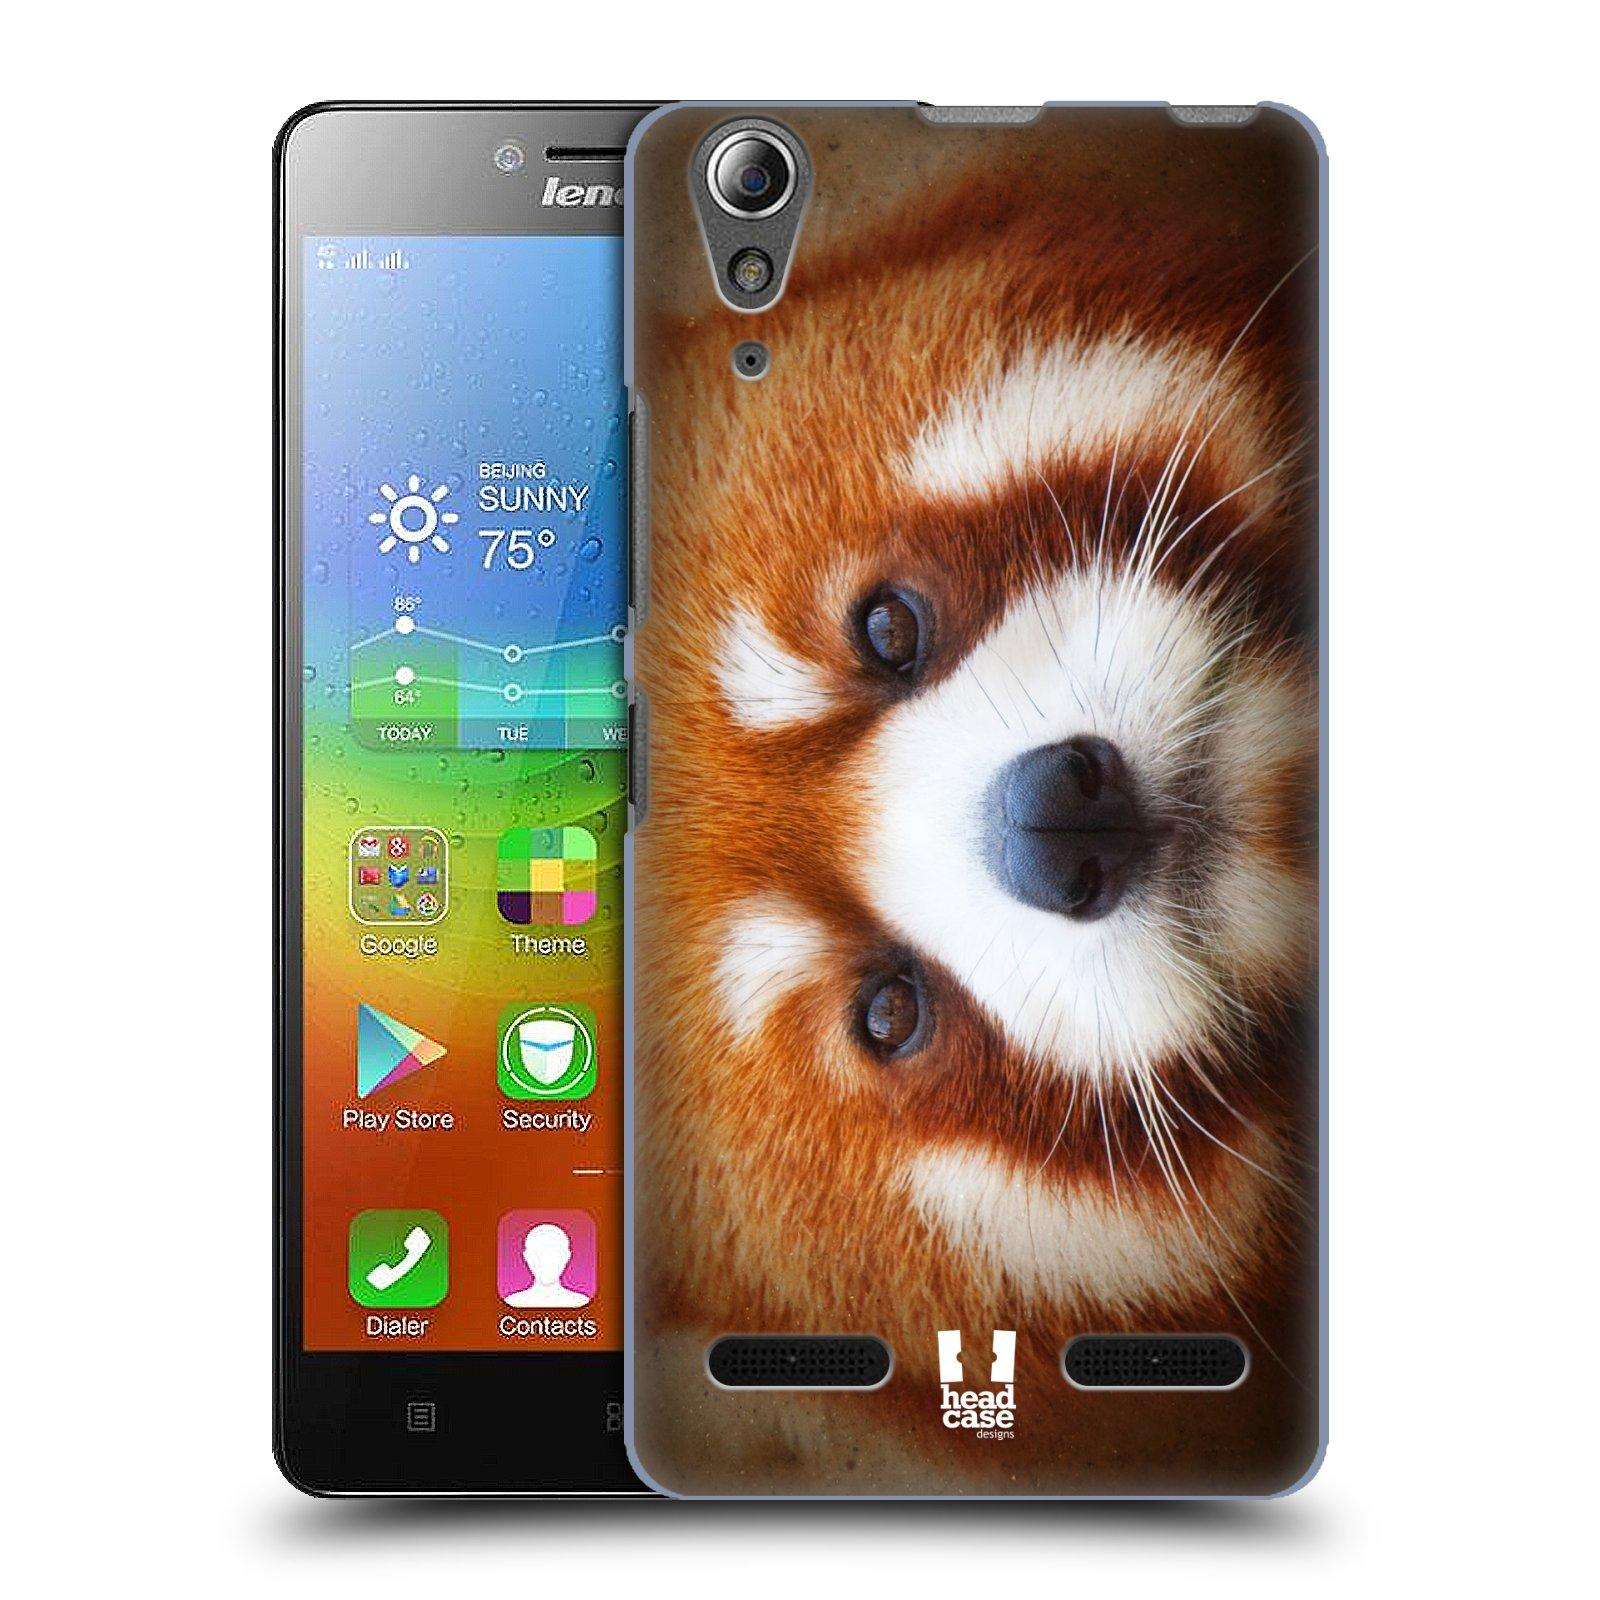 HEAD CASE pevný plastový obal na mobil LENOVO A6000 / A6000 PLUS vzor Zvířecí tváře 2 medvěd panda rudá